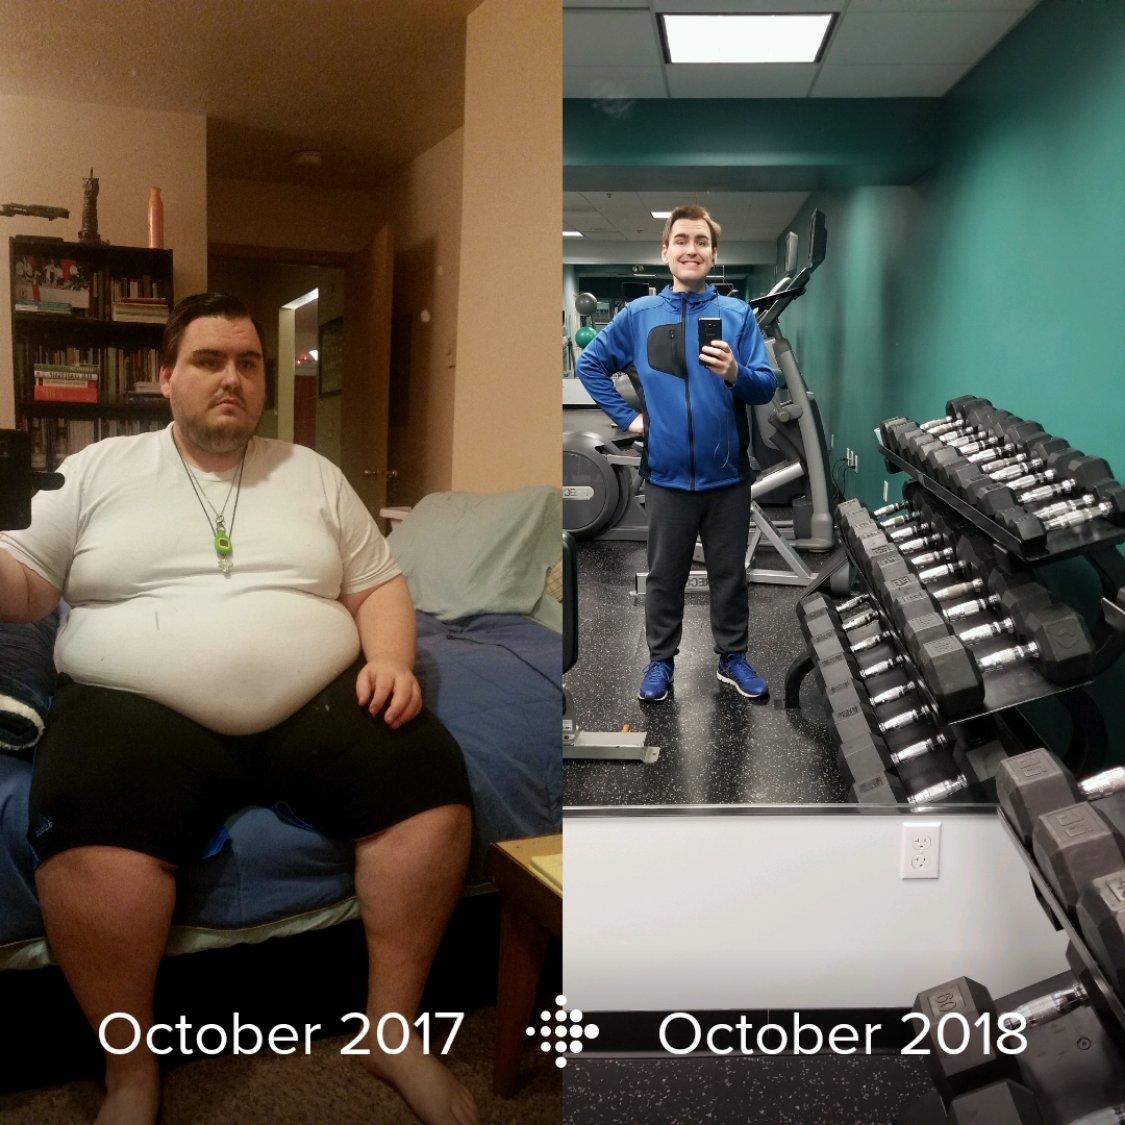 196 lbs Fat Loss 5 foot 9 Male 390 lbs to 194 lbs